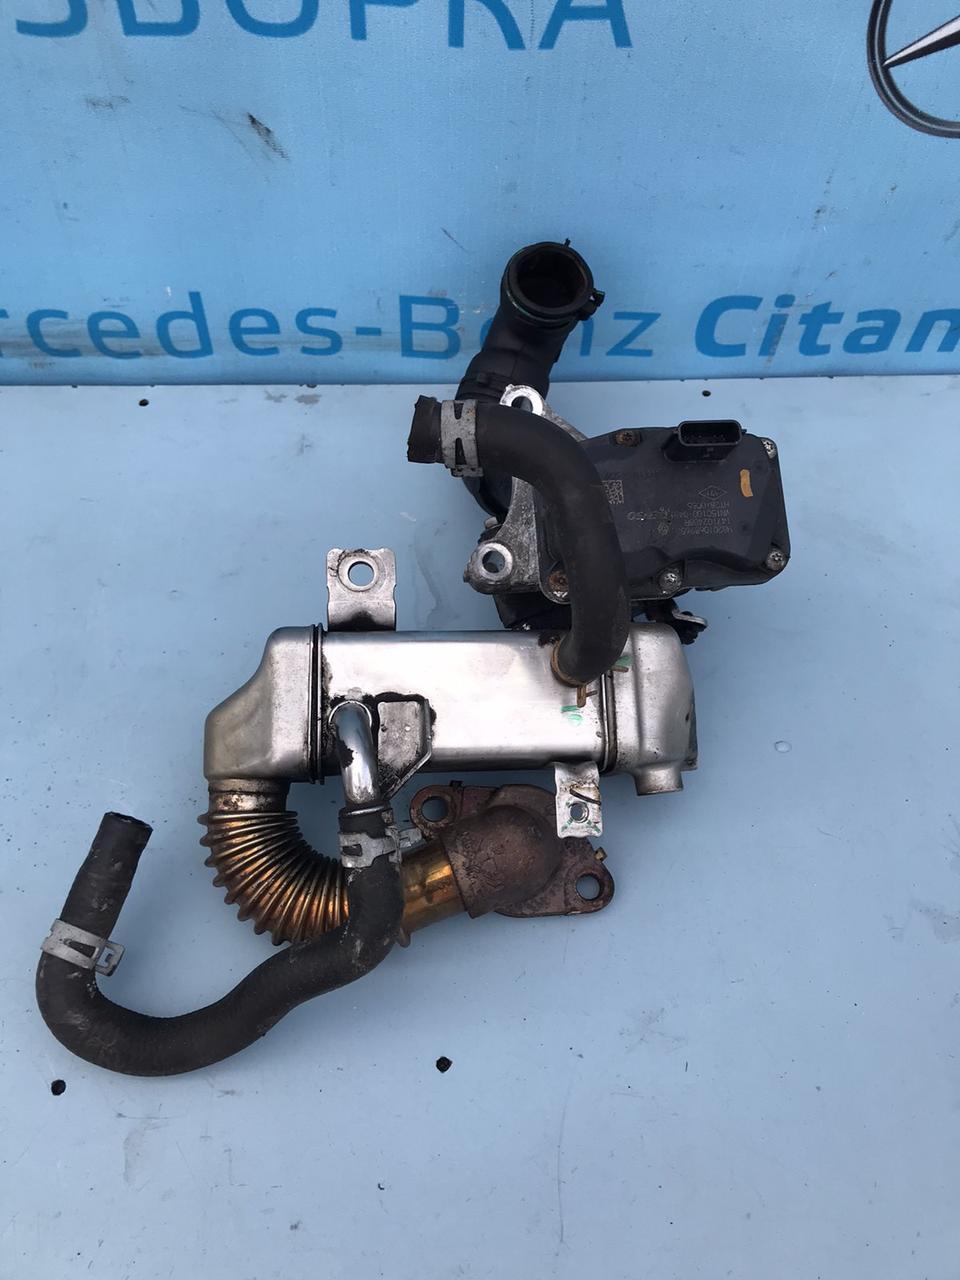 Клапан EGR однотурбинный 147102408r Opel Vivaro Опель Виваро 1.6 dci 2014-2020 г. в.